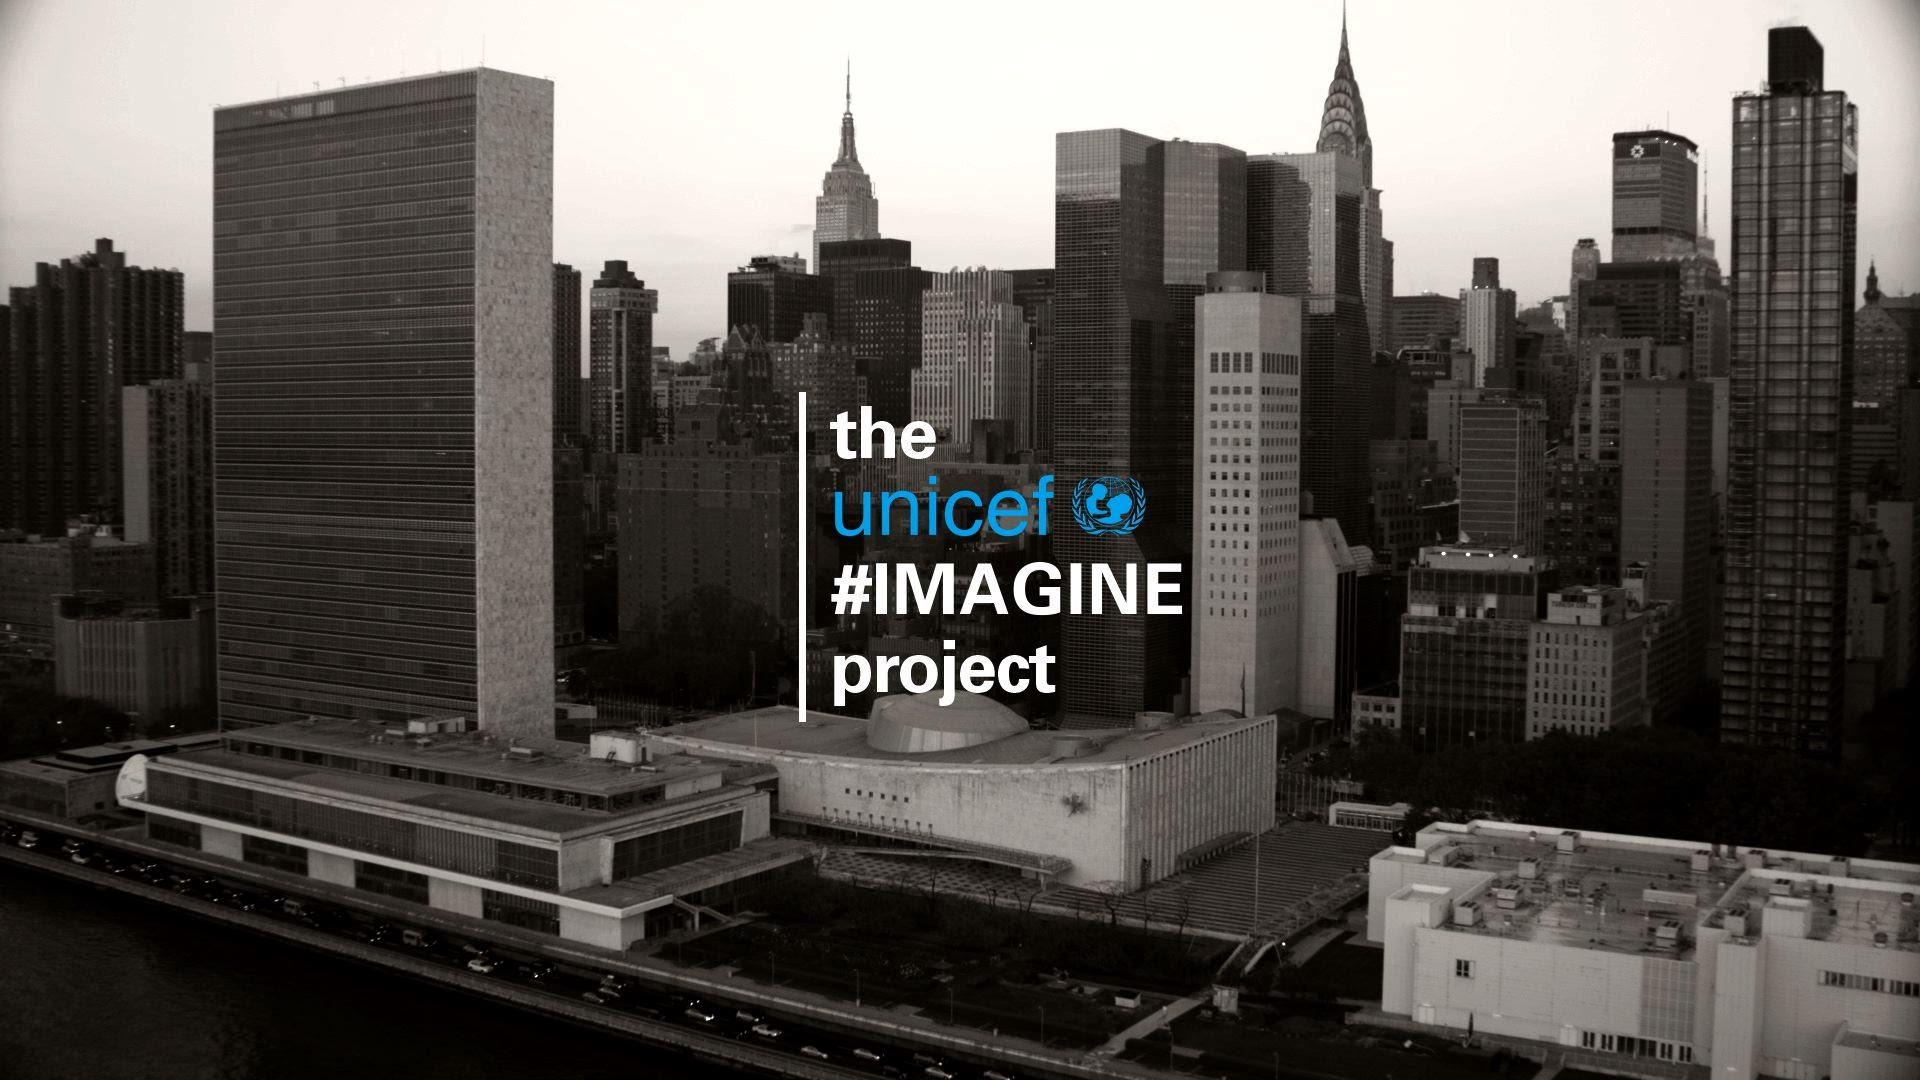 「UNICEF子供達のために豪華有名人が歌う『Imagine』」- UNICEF: Imagine a Better Future for All Children